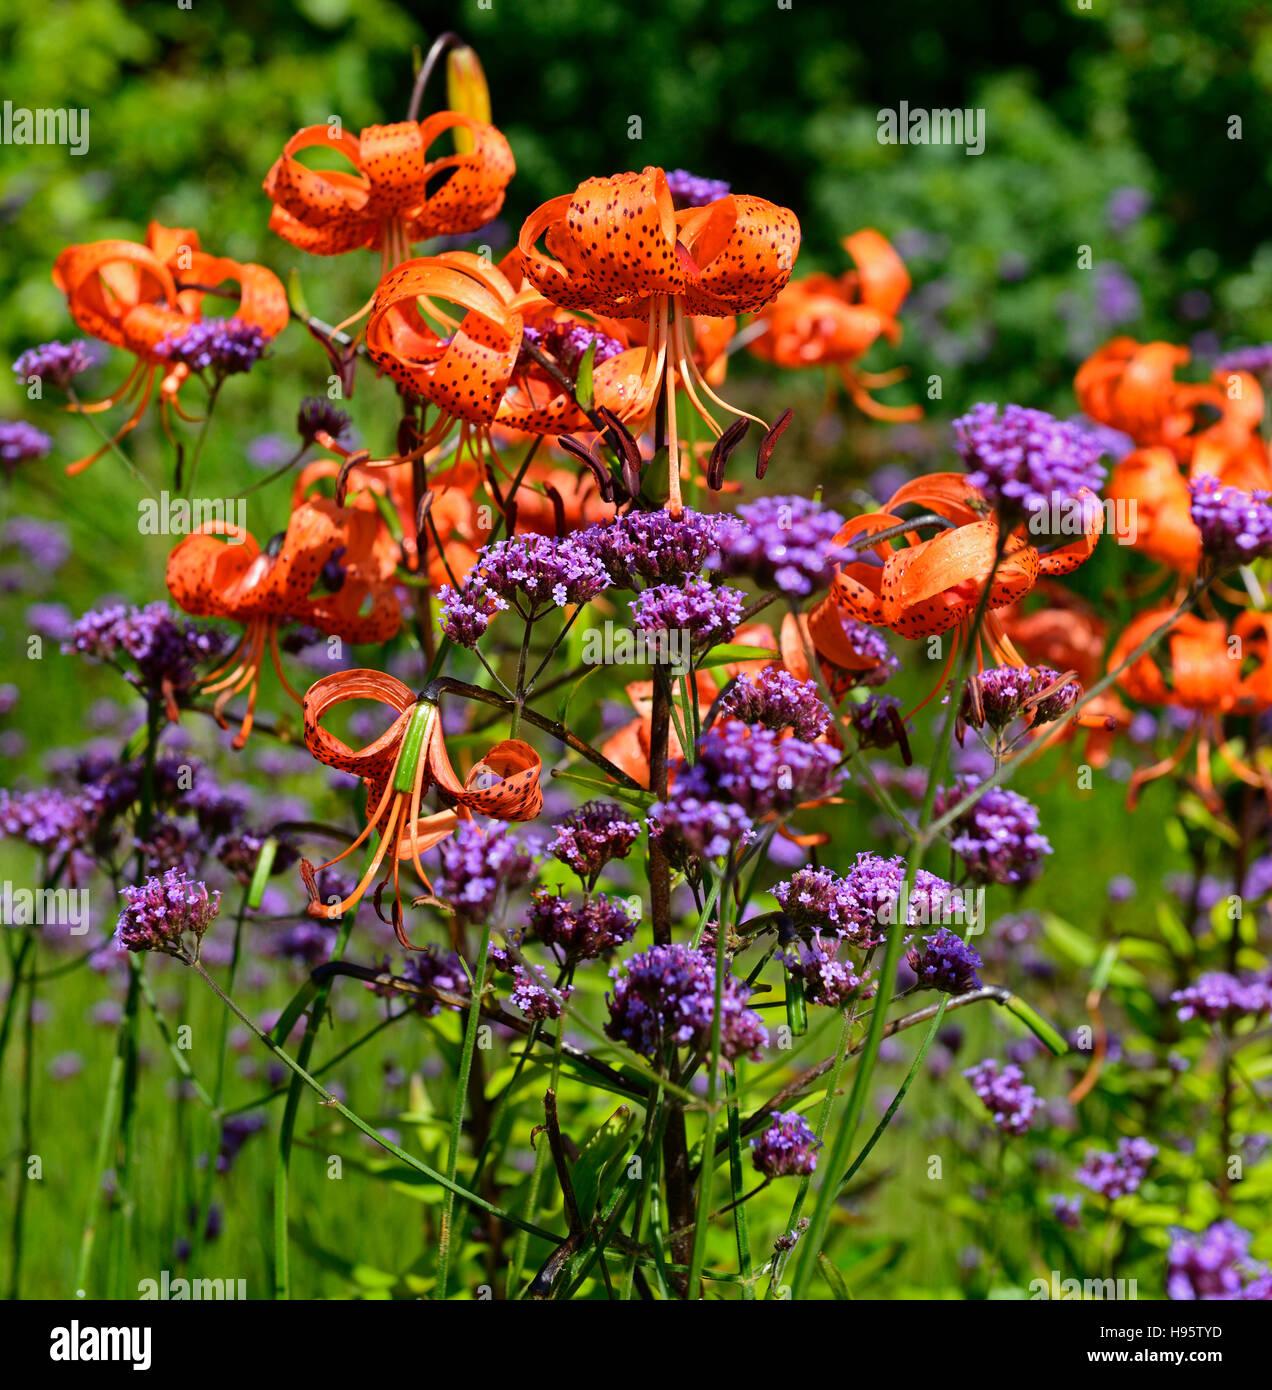 verbena flowers orange stock photos verbena flowers orange stock images alamy. Black Bedroom Furniture Sets. Home Design Ideas